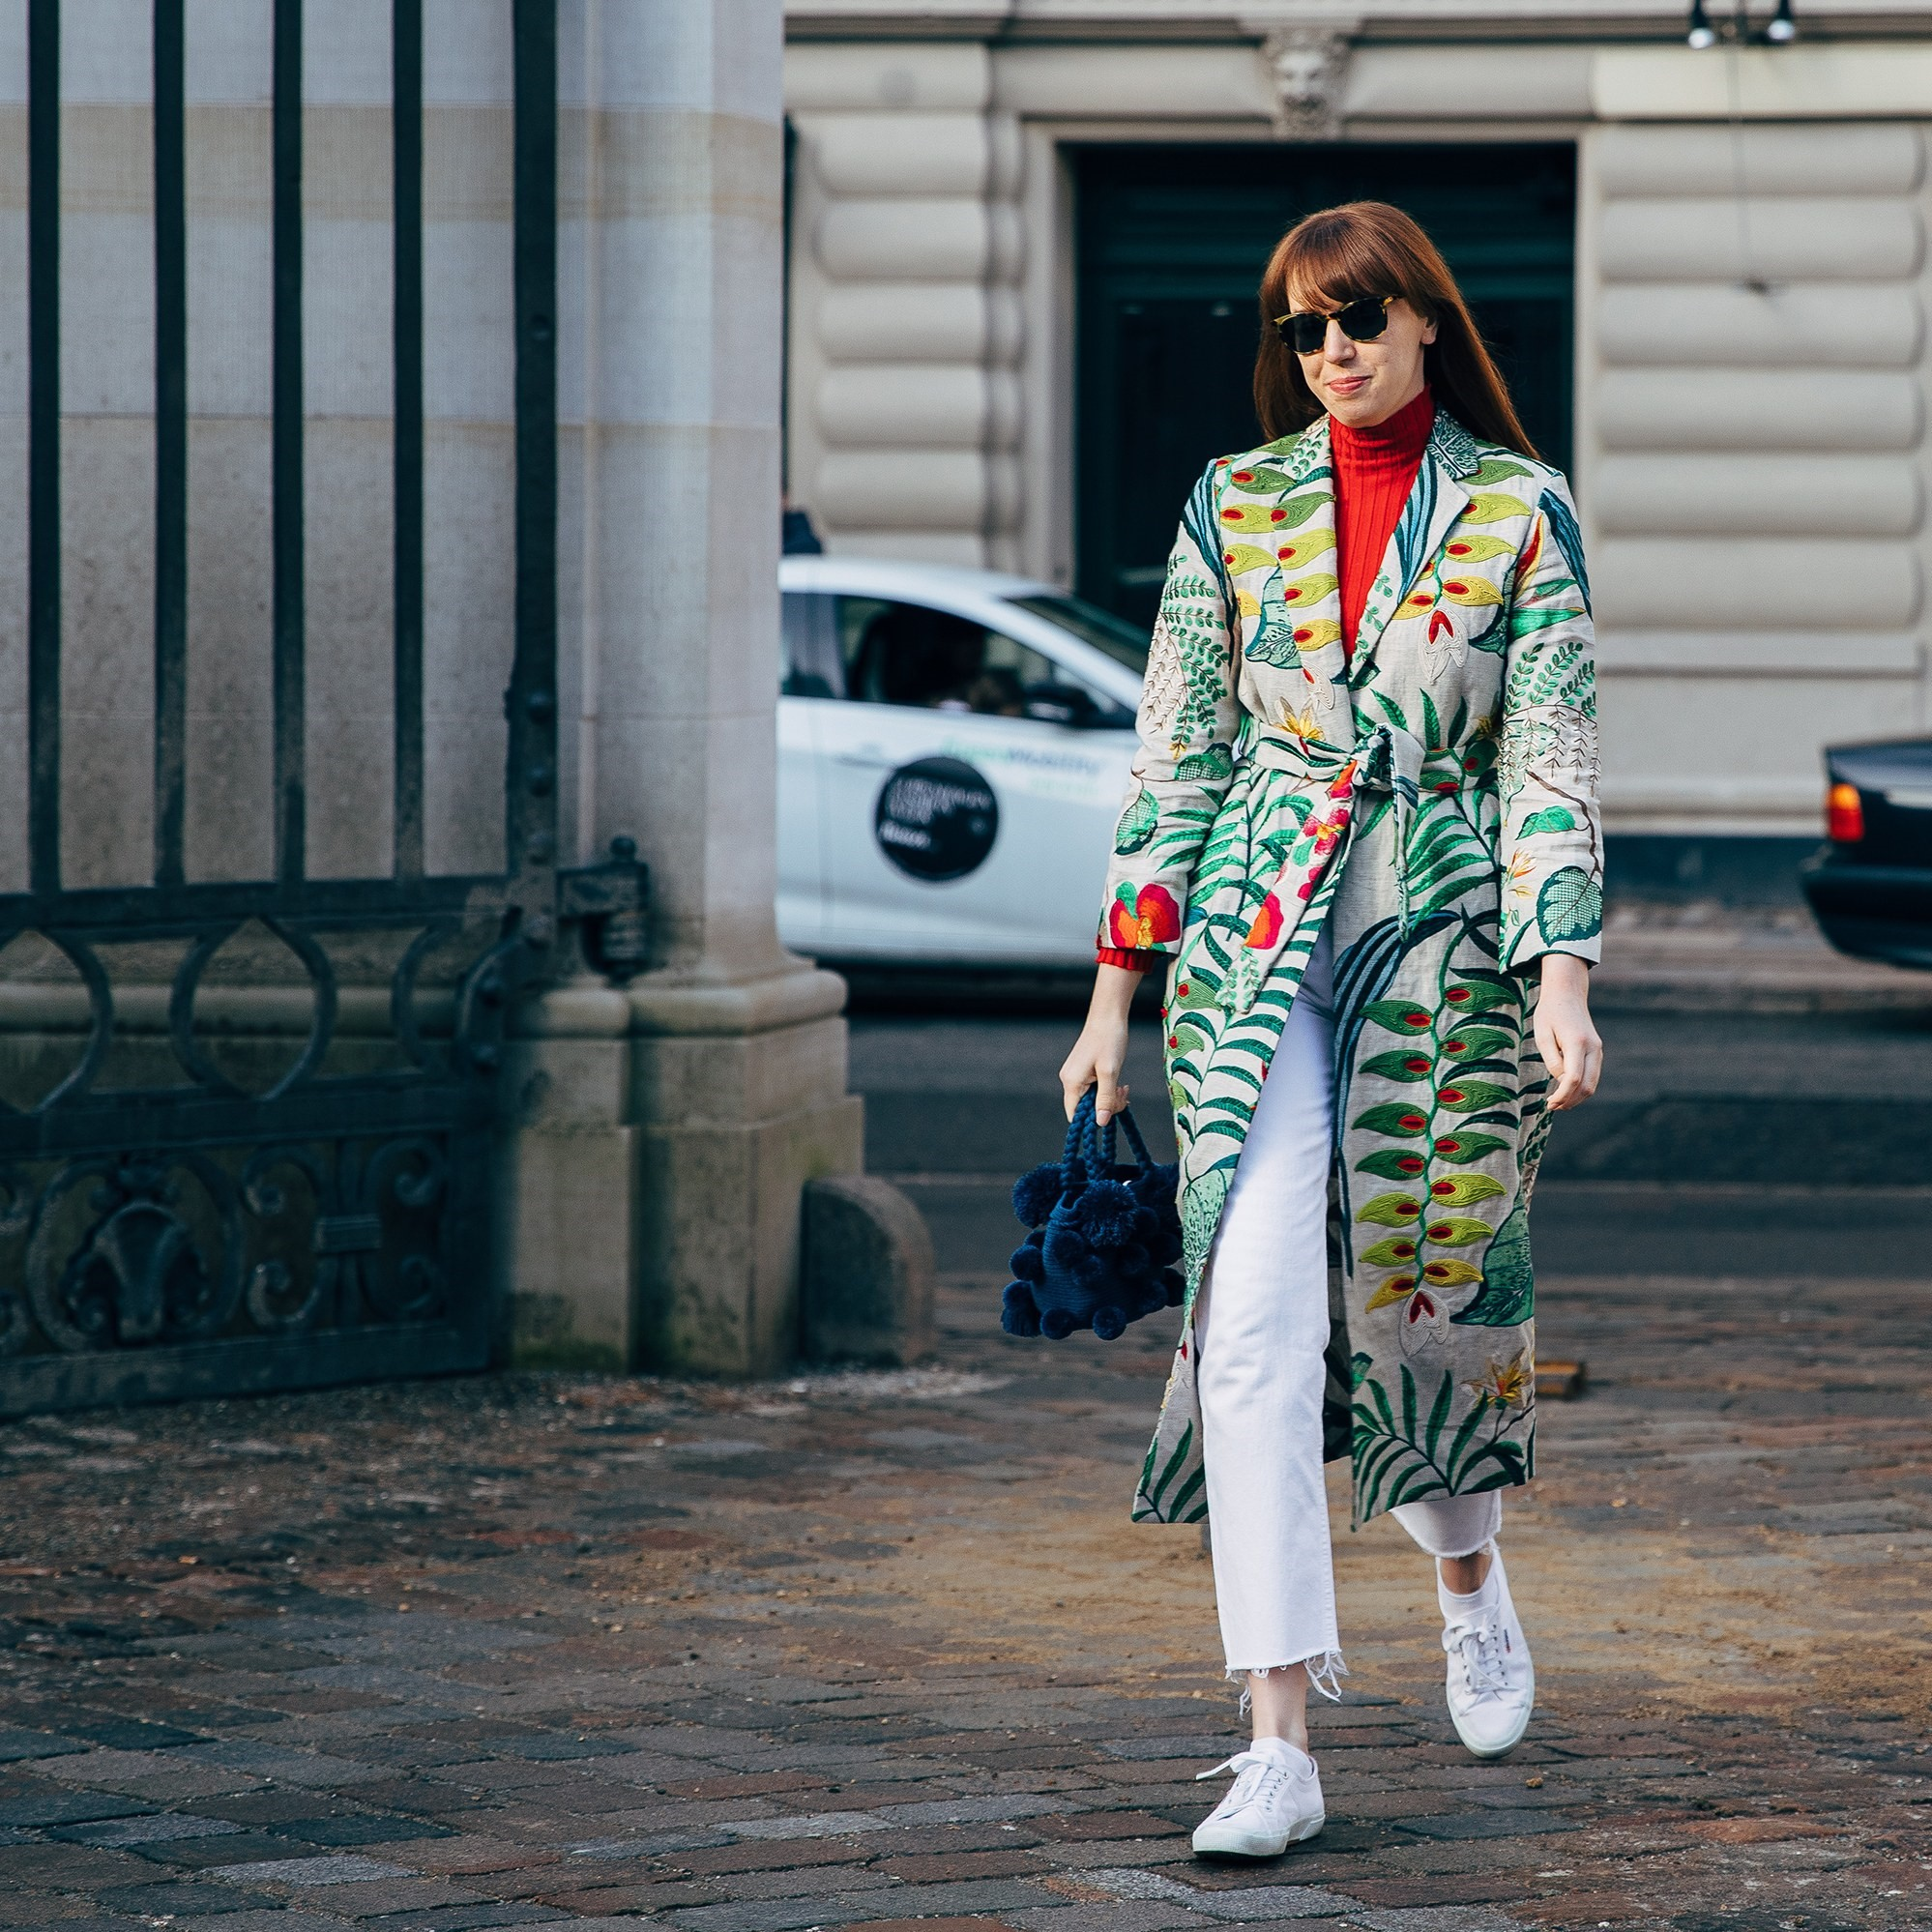 ERIN FITZPATRICK - Heliconias Kimono  #SeniorNewsEditor # @whowhatwear  #LA #almagirl #girlboss  @Copenhaguen Fashion Week